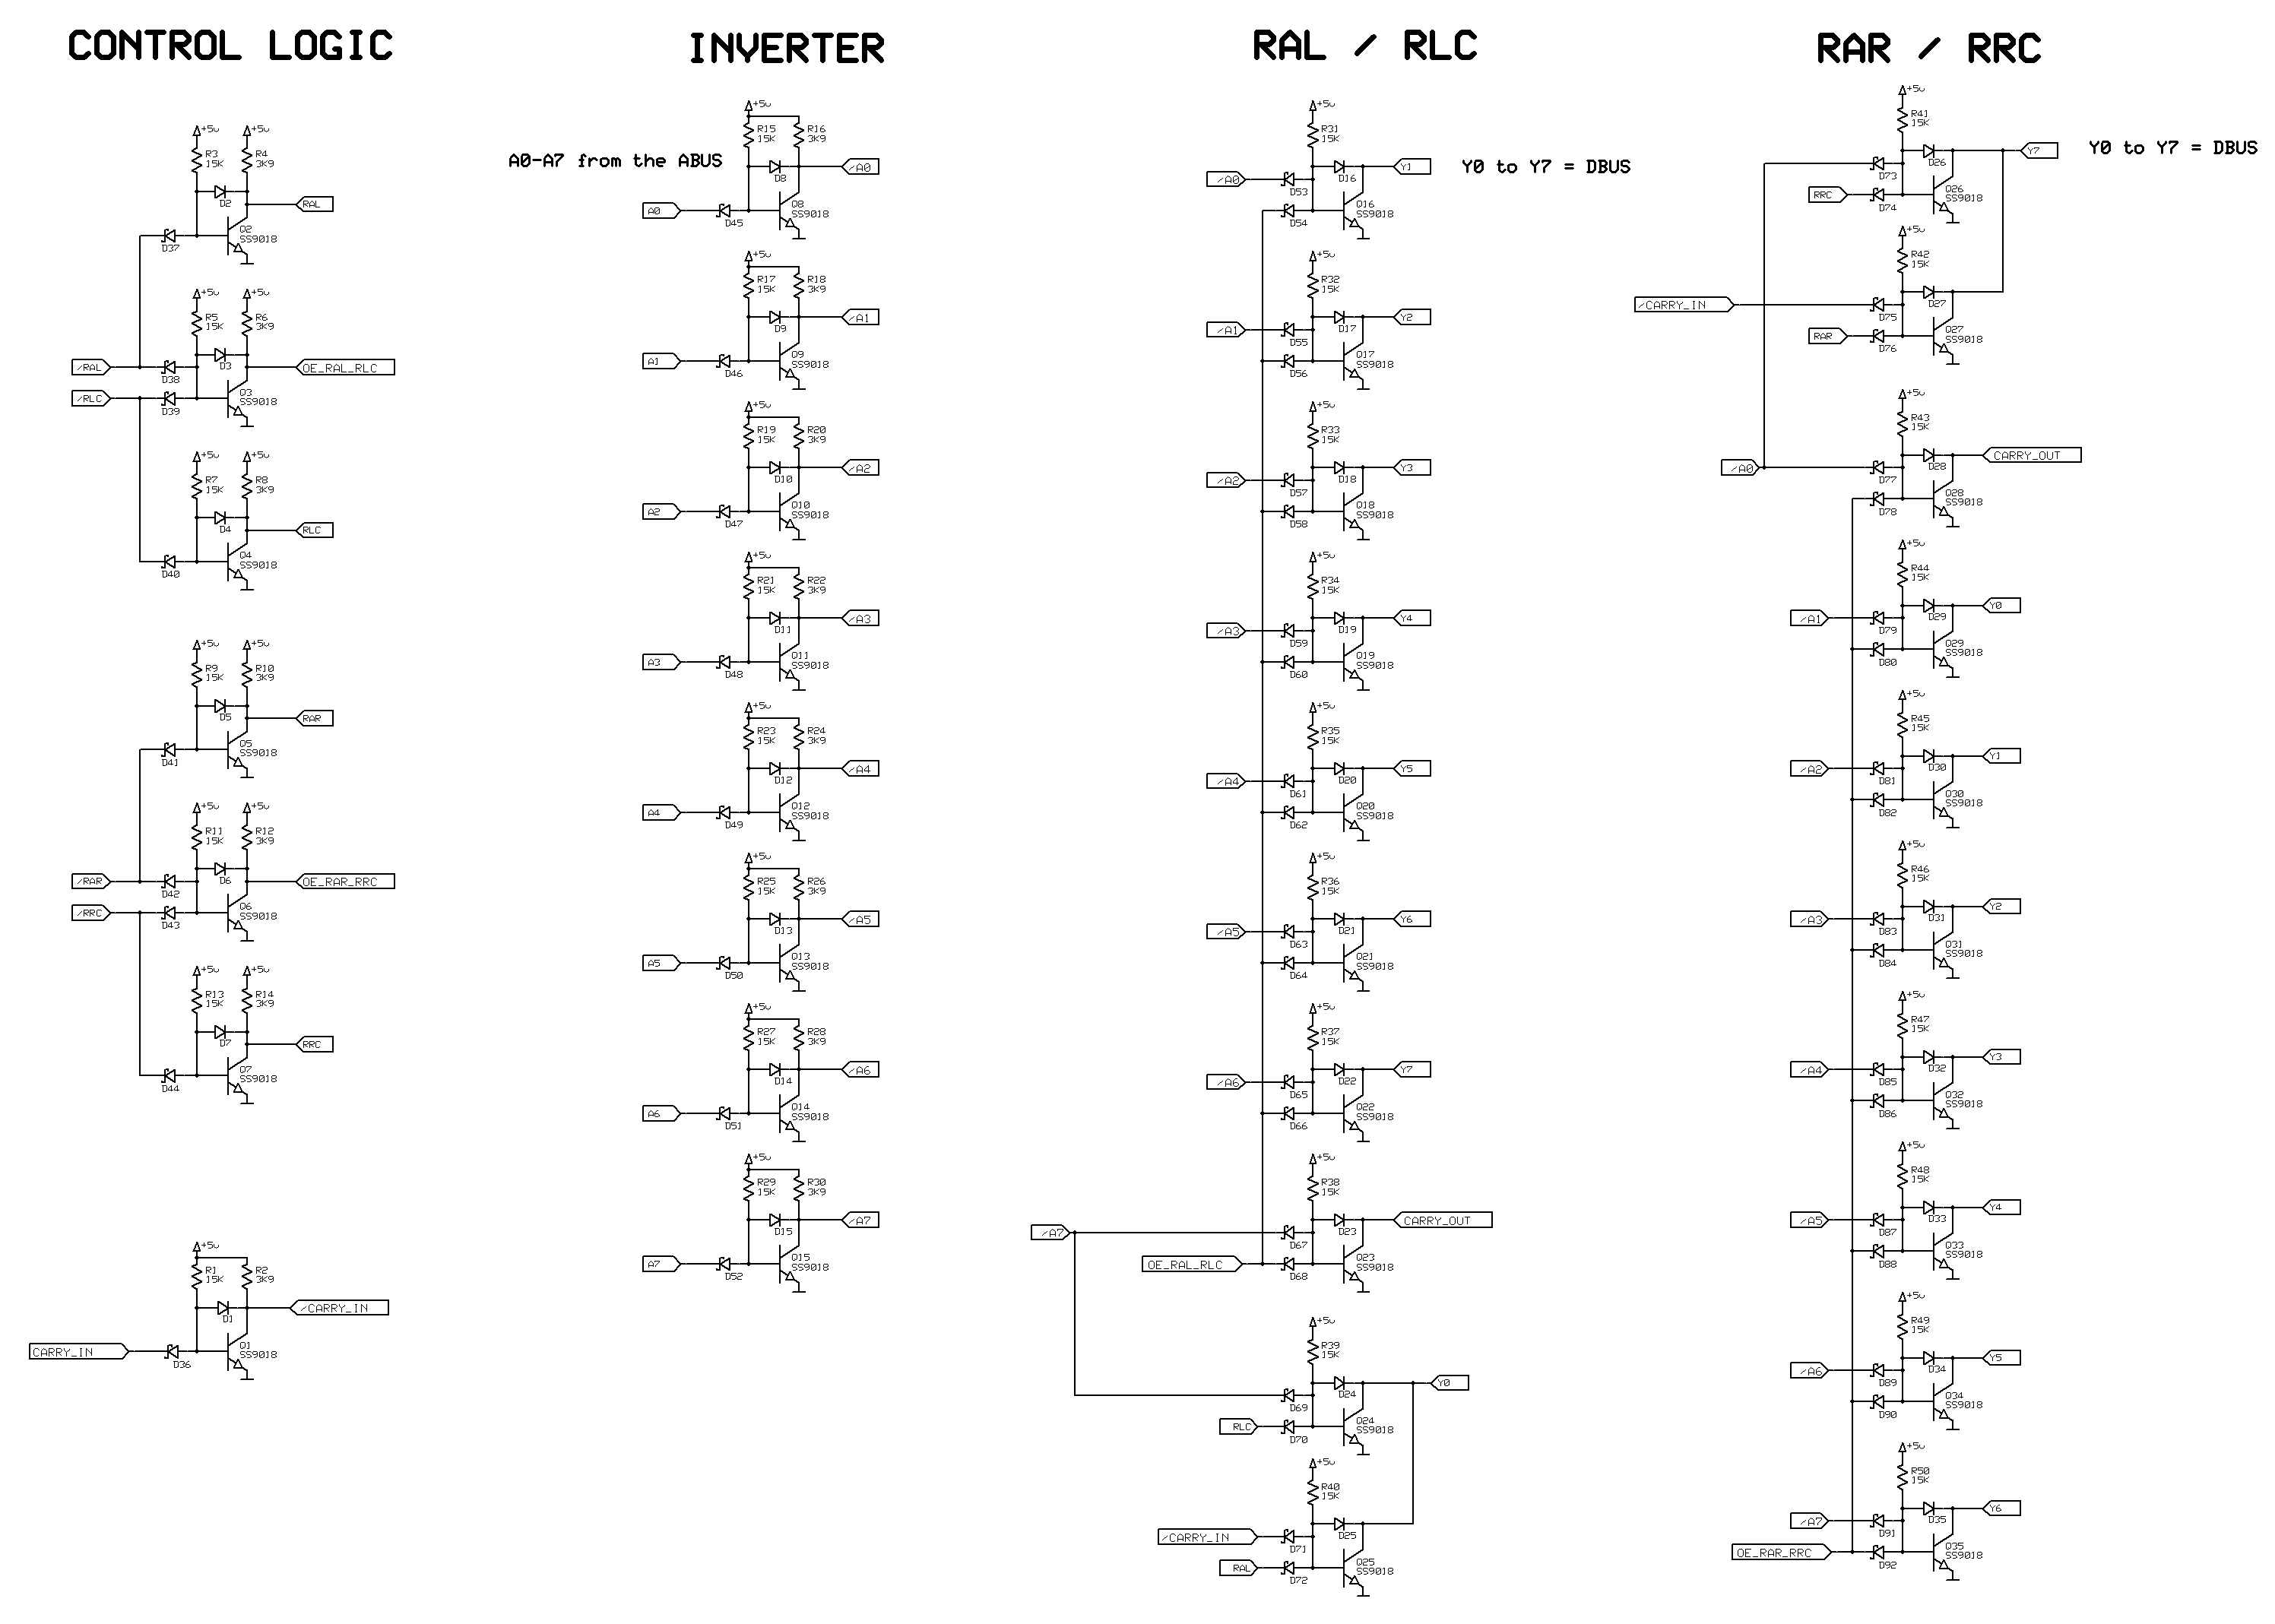 alu  beautiful bit alu logic diagram wiring diagram